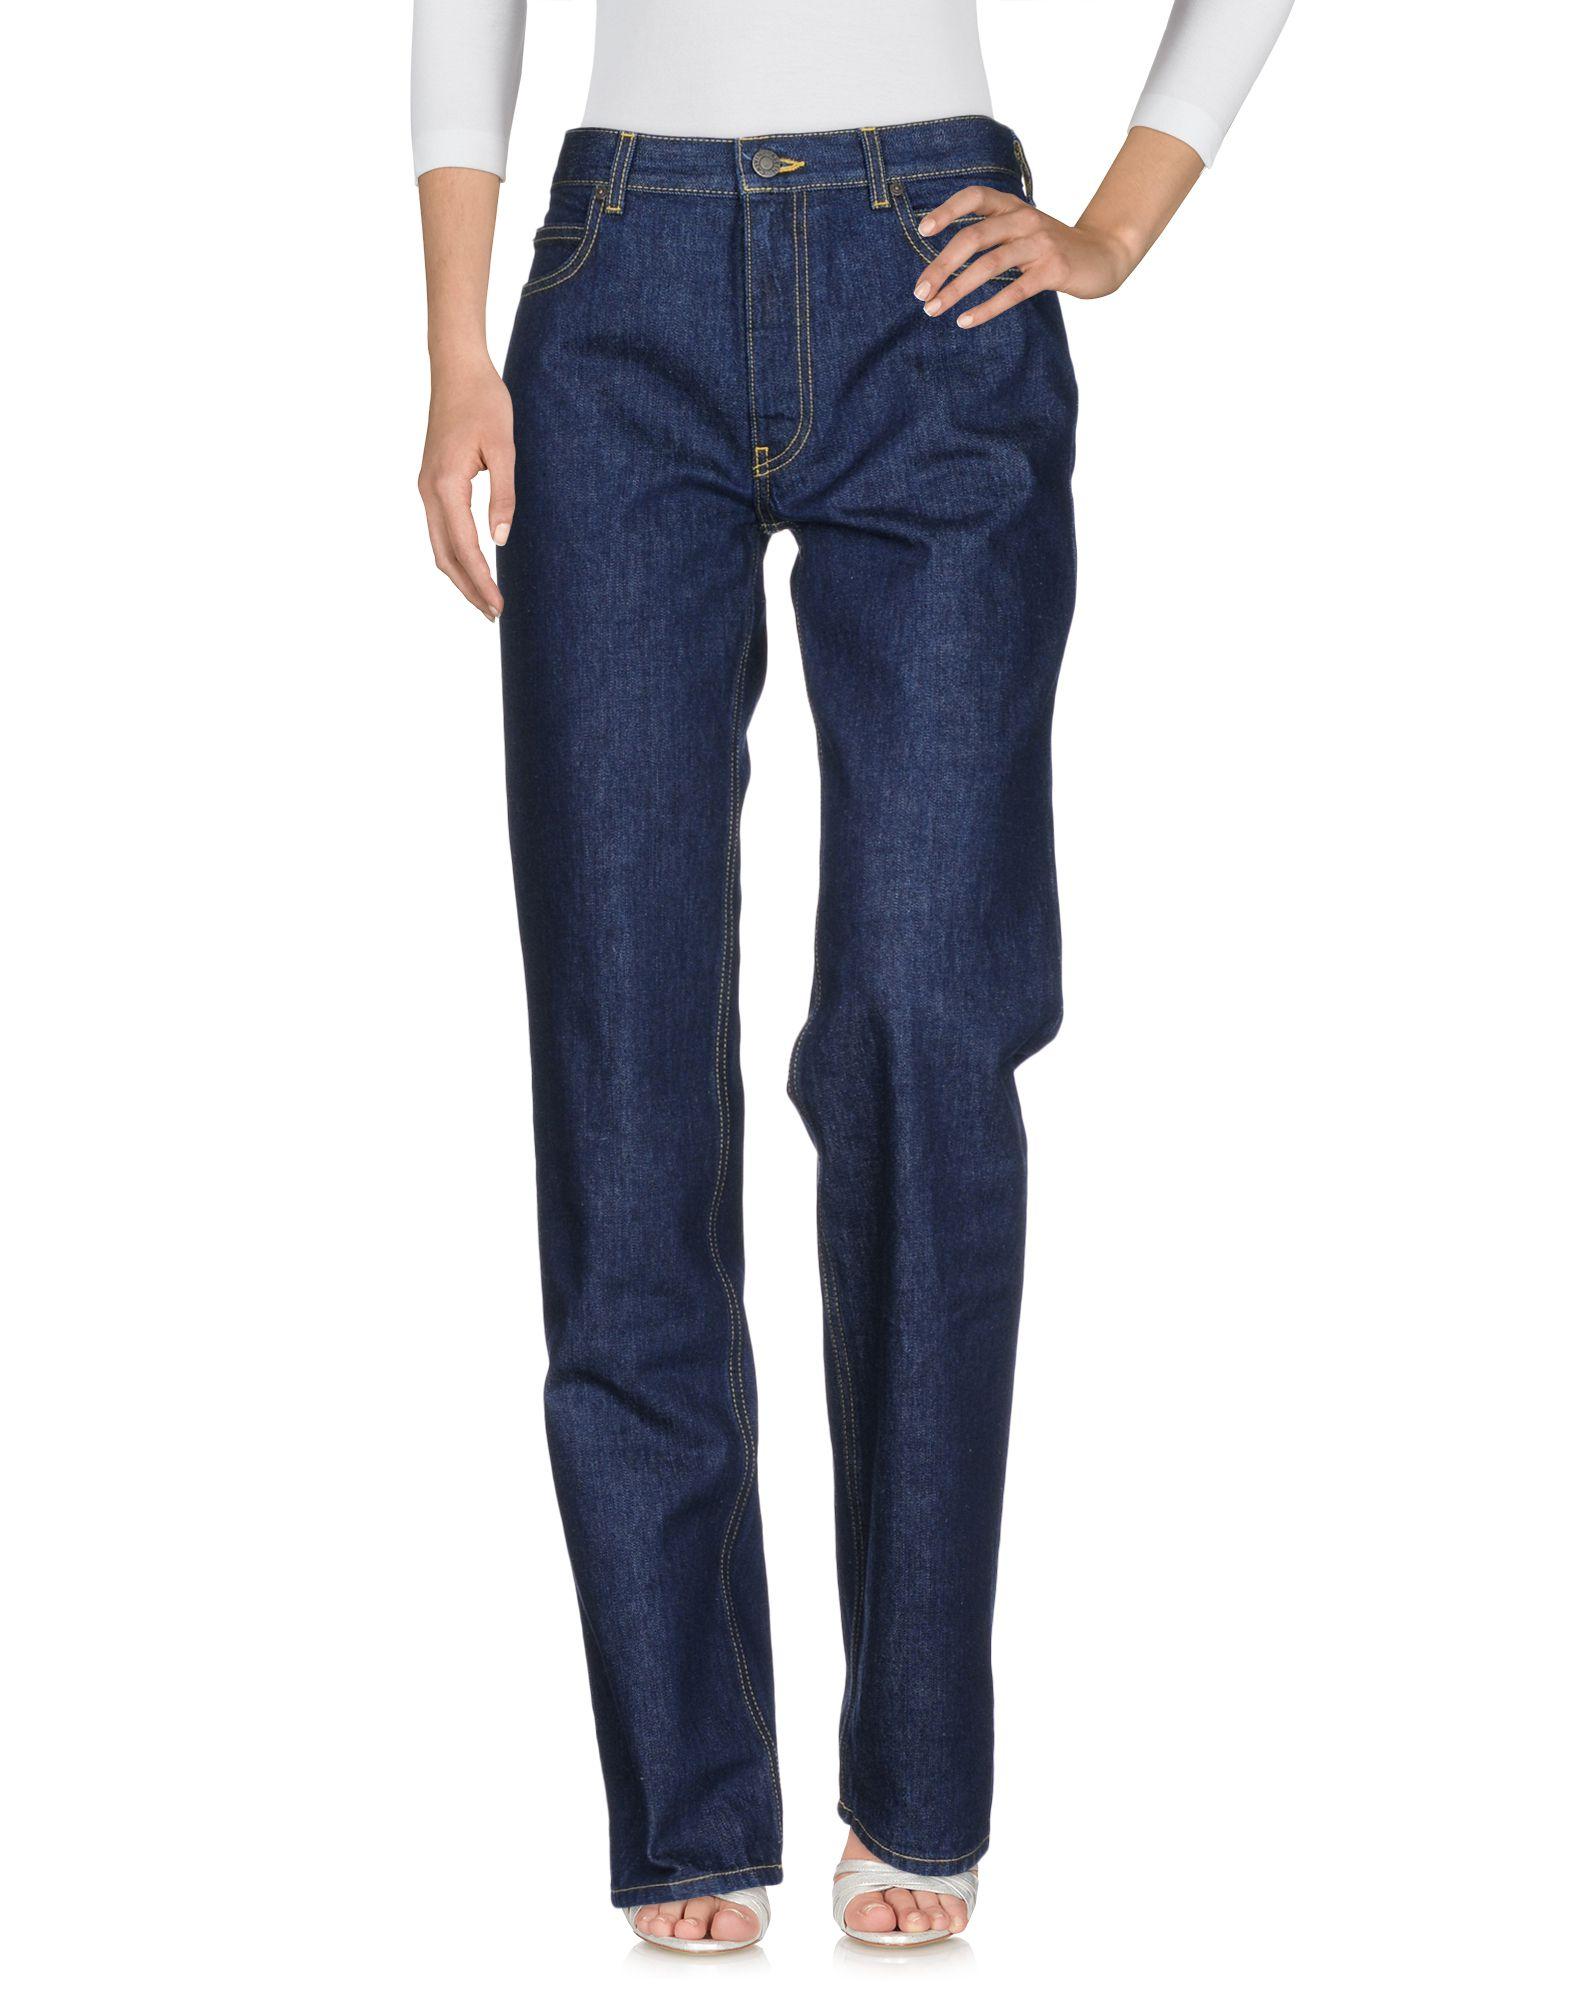 Pantaloni Jeans Calvin Klein Jeans Donna - Acquista online su bHNYlt2T